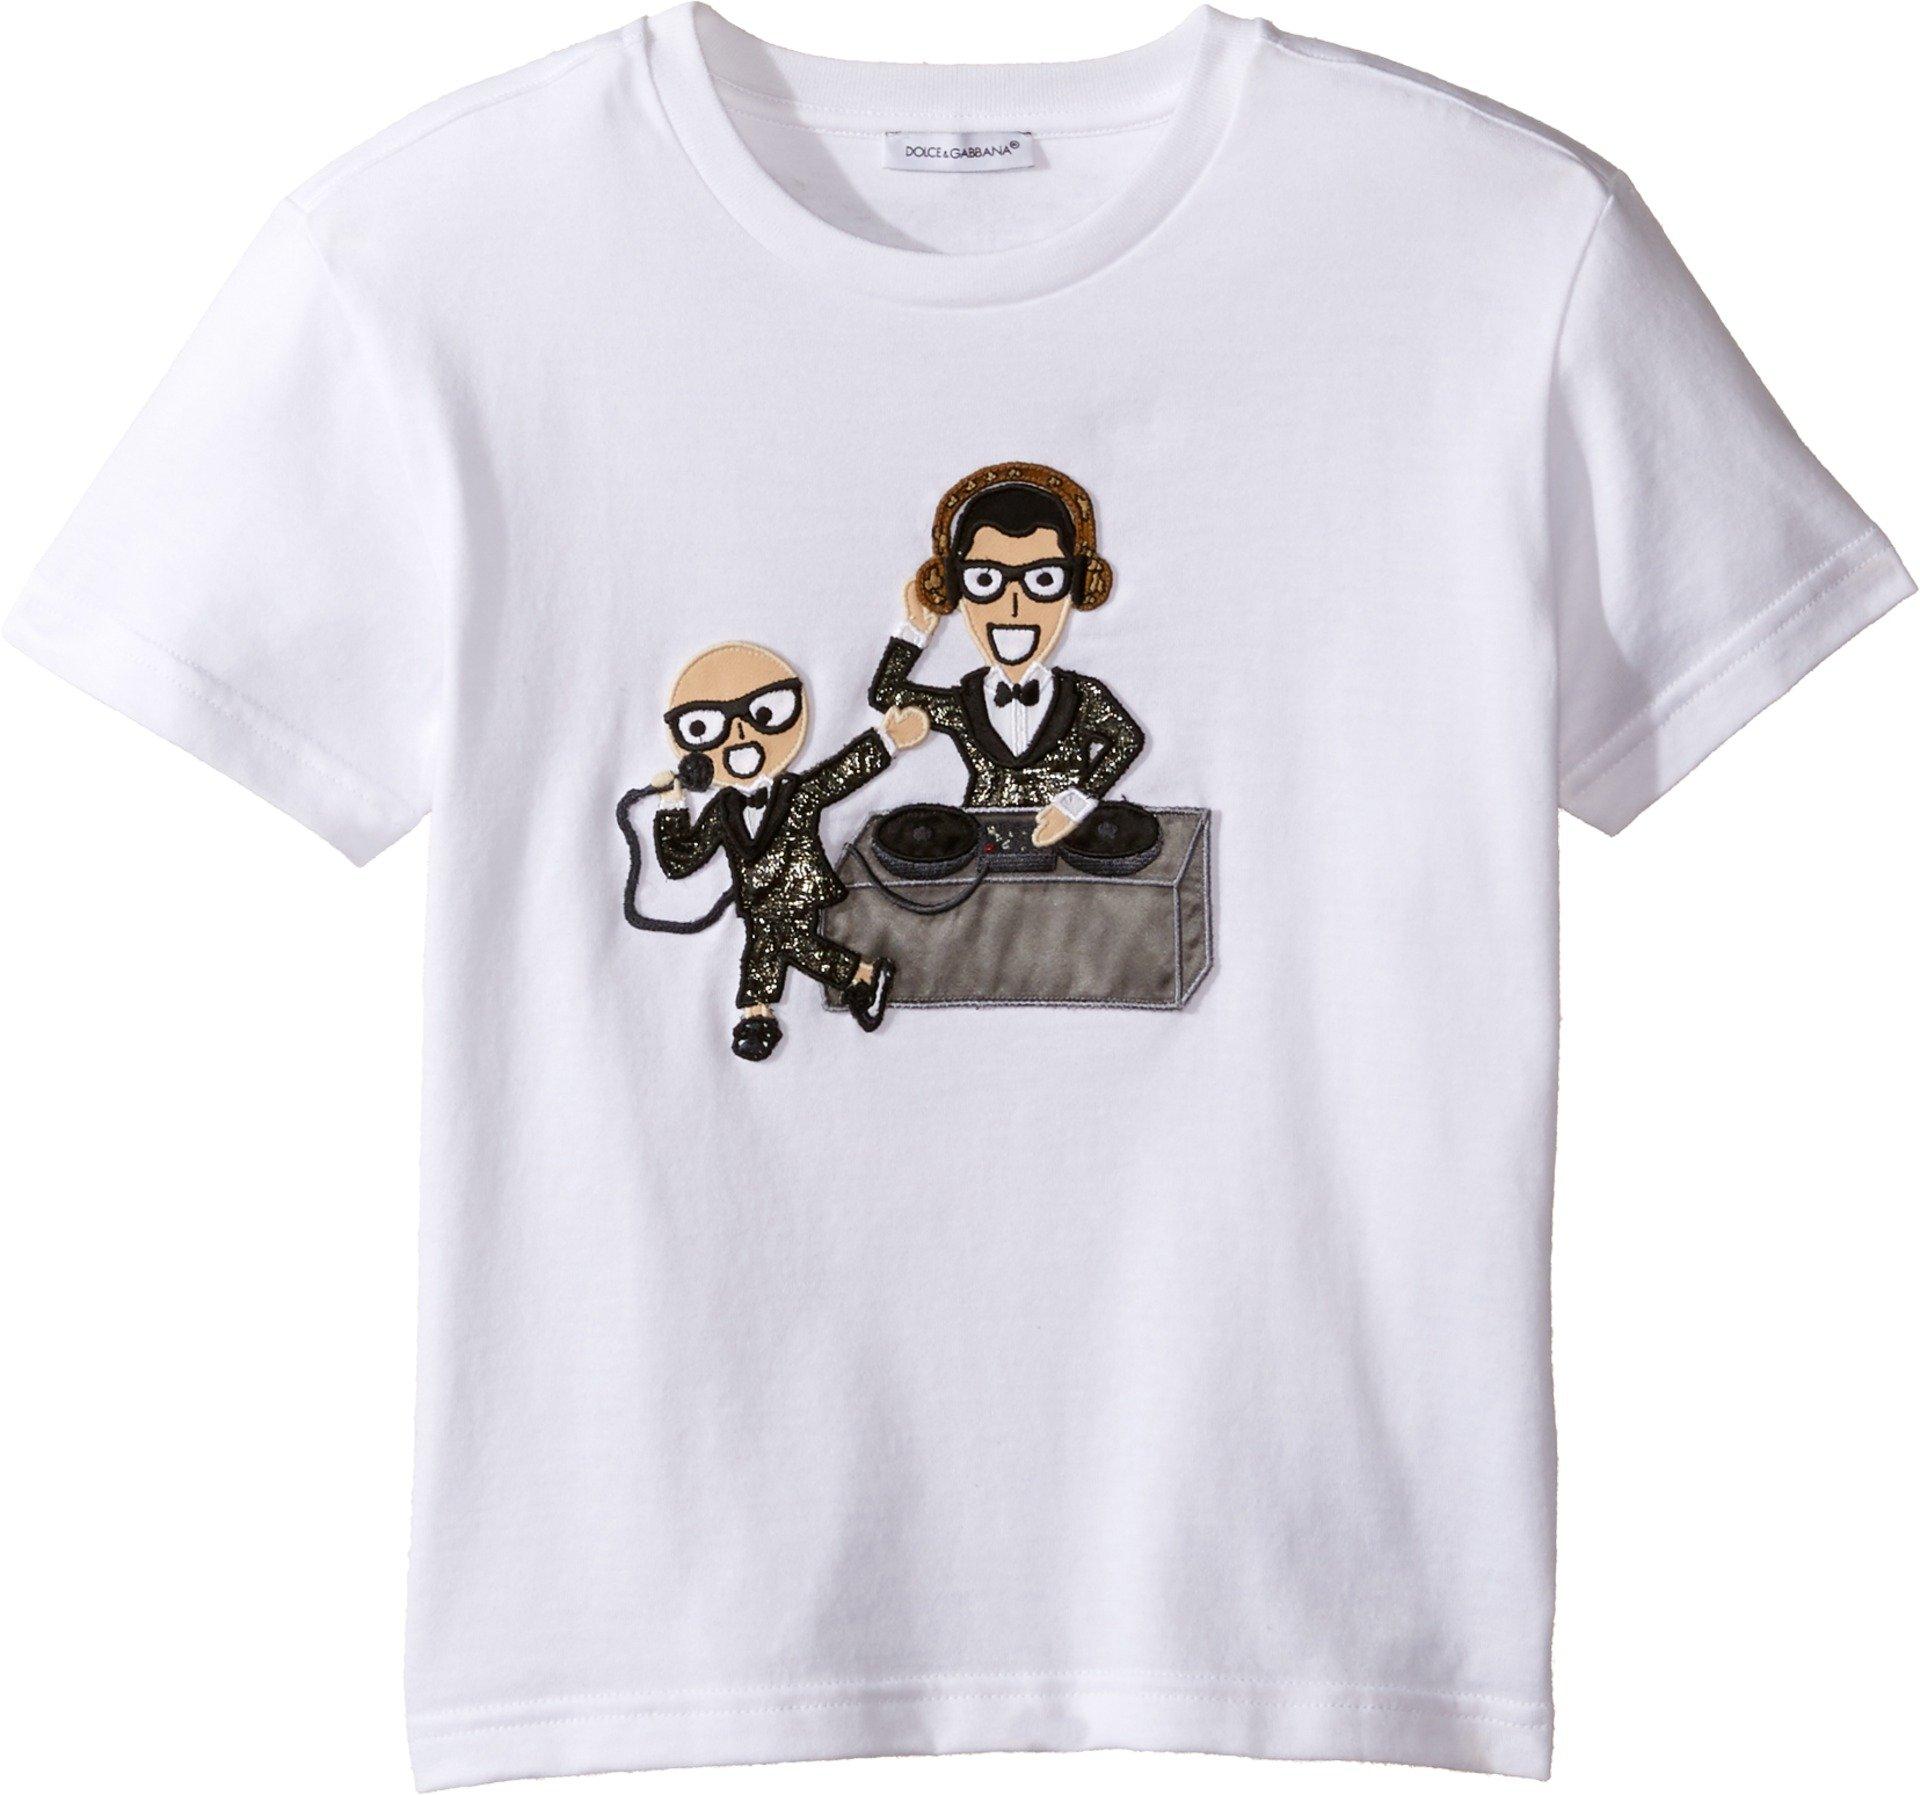 Dolce & Gabbana Kids Baby Boy's Designers Tee (Toddler/Little Kids) White Print T-Shirt